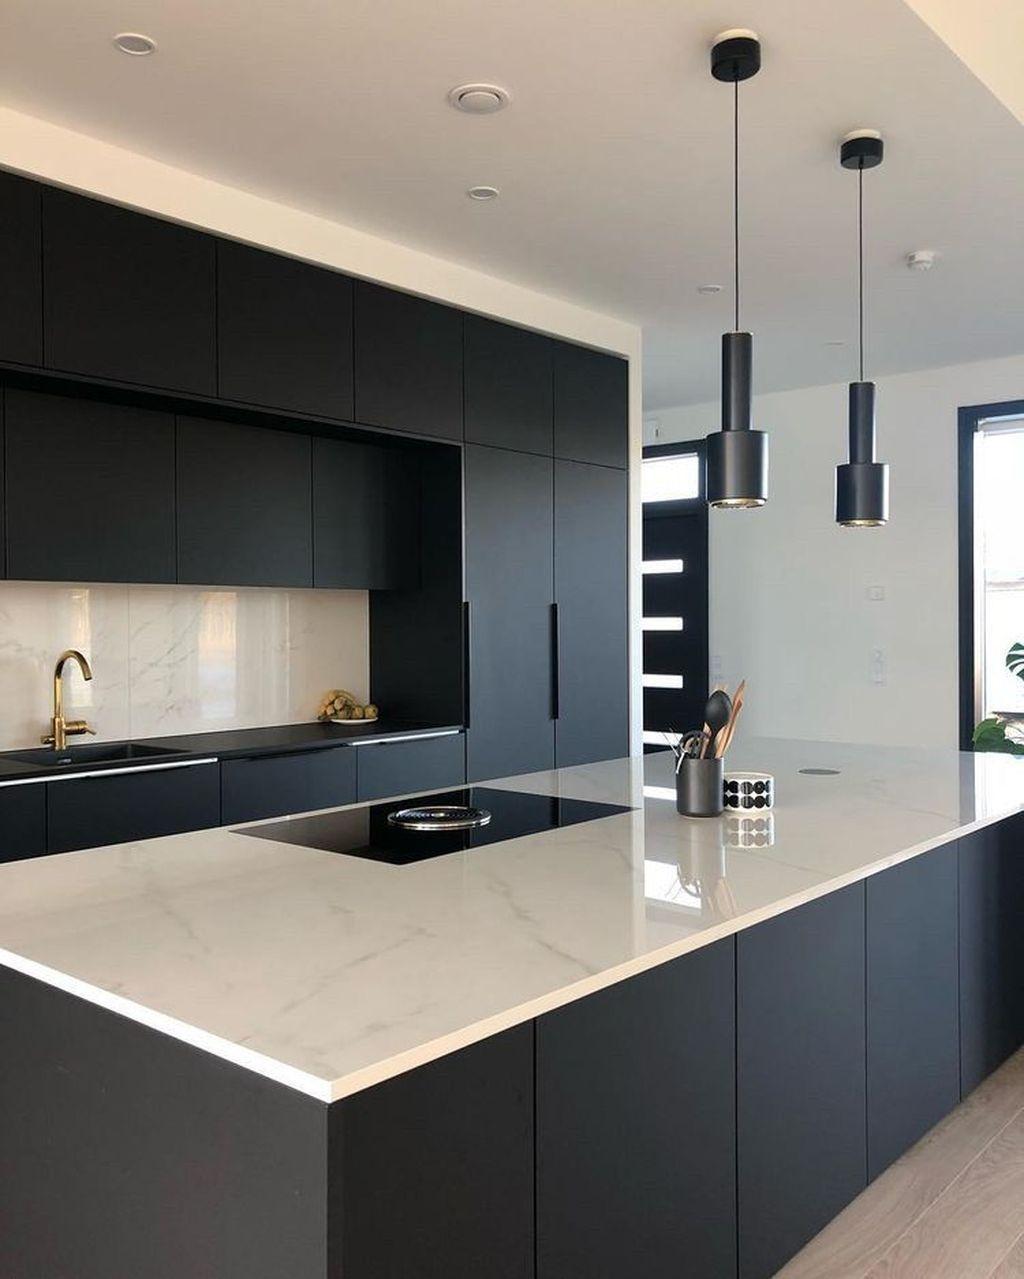 9 Totally Inspiring Modern Kitchen Design Ideas   PIMPHOMEE ...